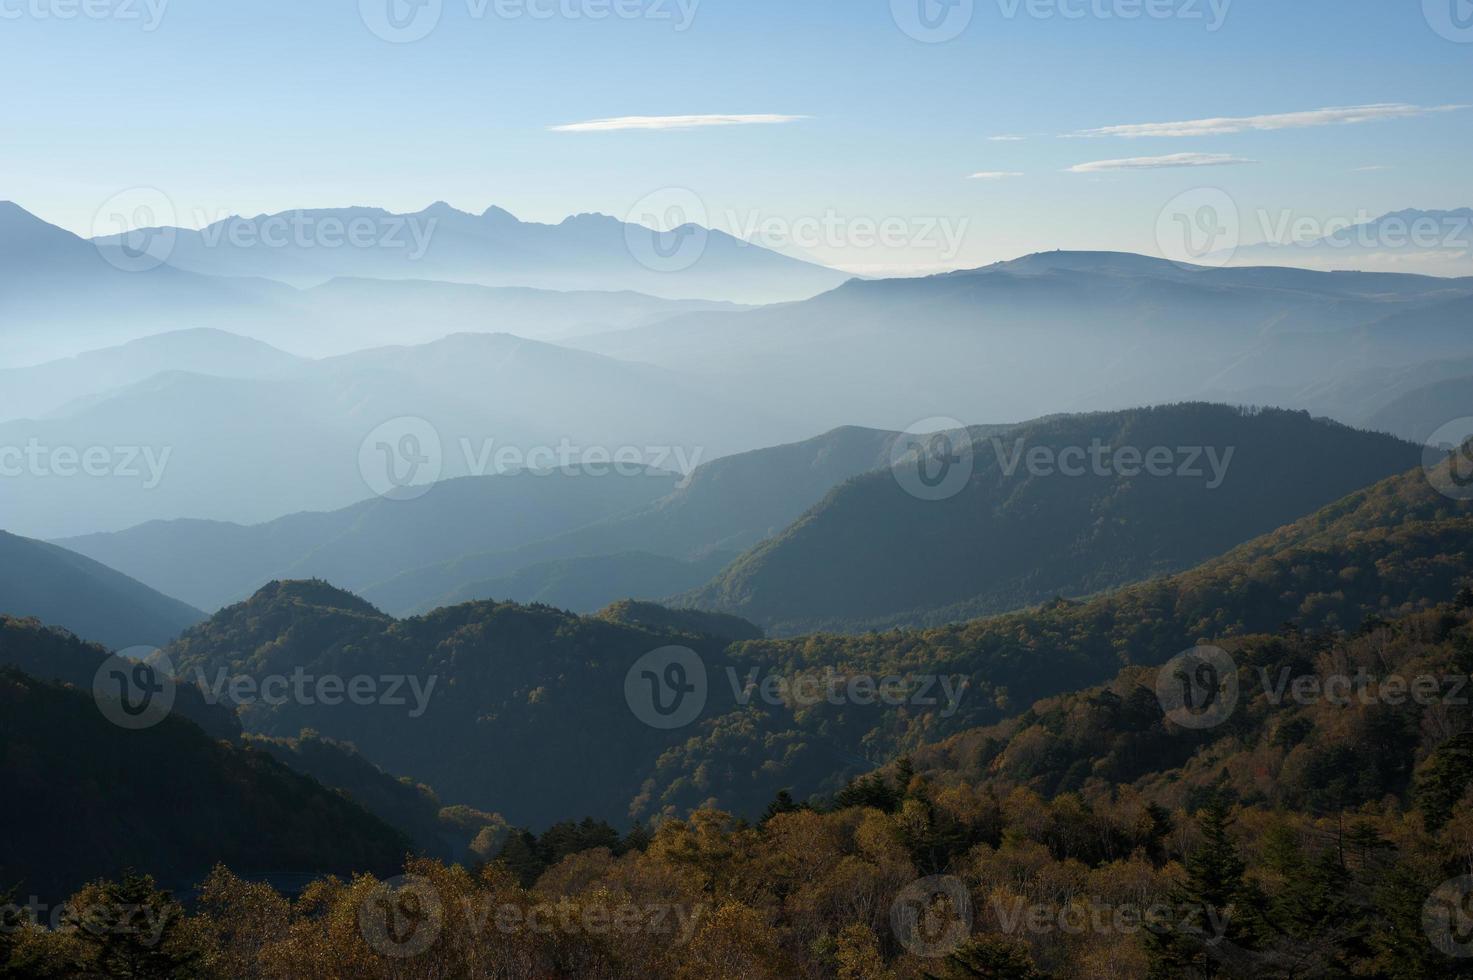 Utsukushigahara Plateau photo